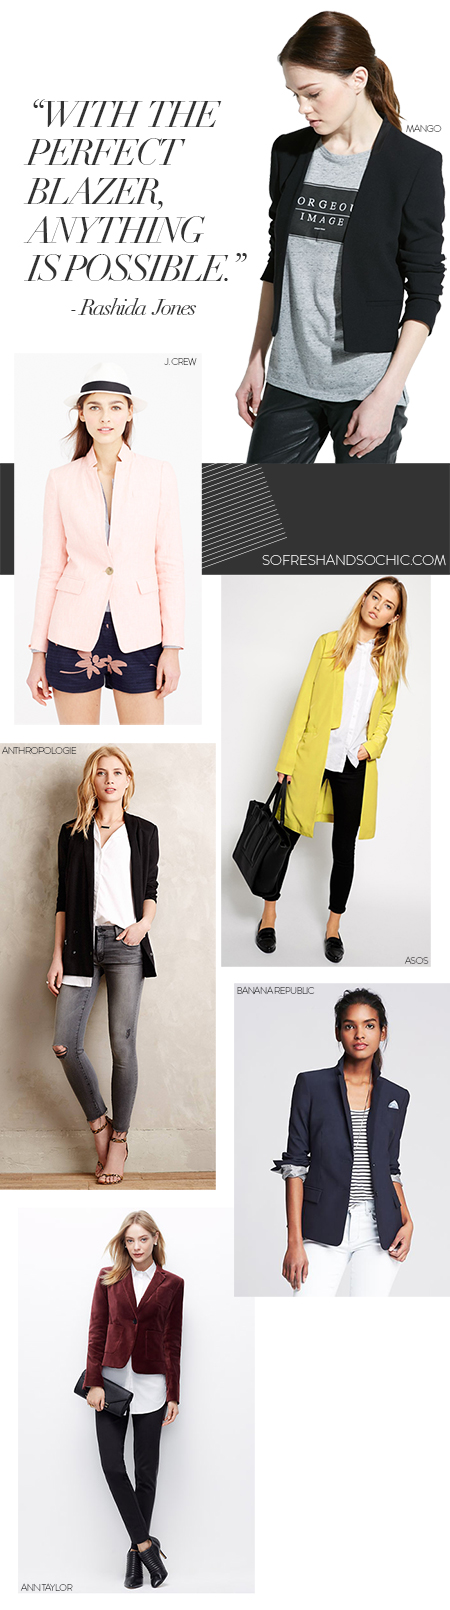 So Fresh & So Chic // Wardrobe Picks: The Blazer. See & shop my Top Picks for this super versatile piece! How many blazers do you own? #sofreshandsochic #womensfashion #mystyle